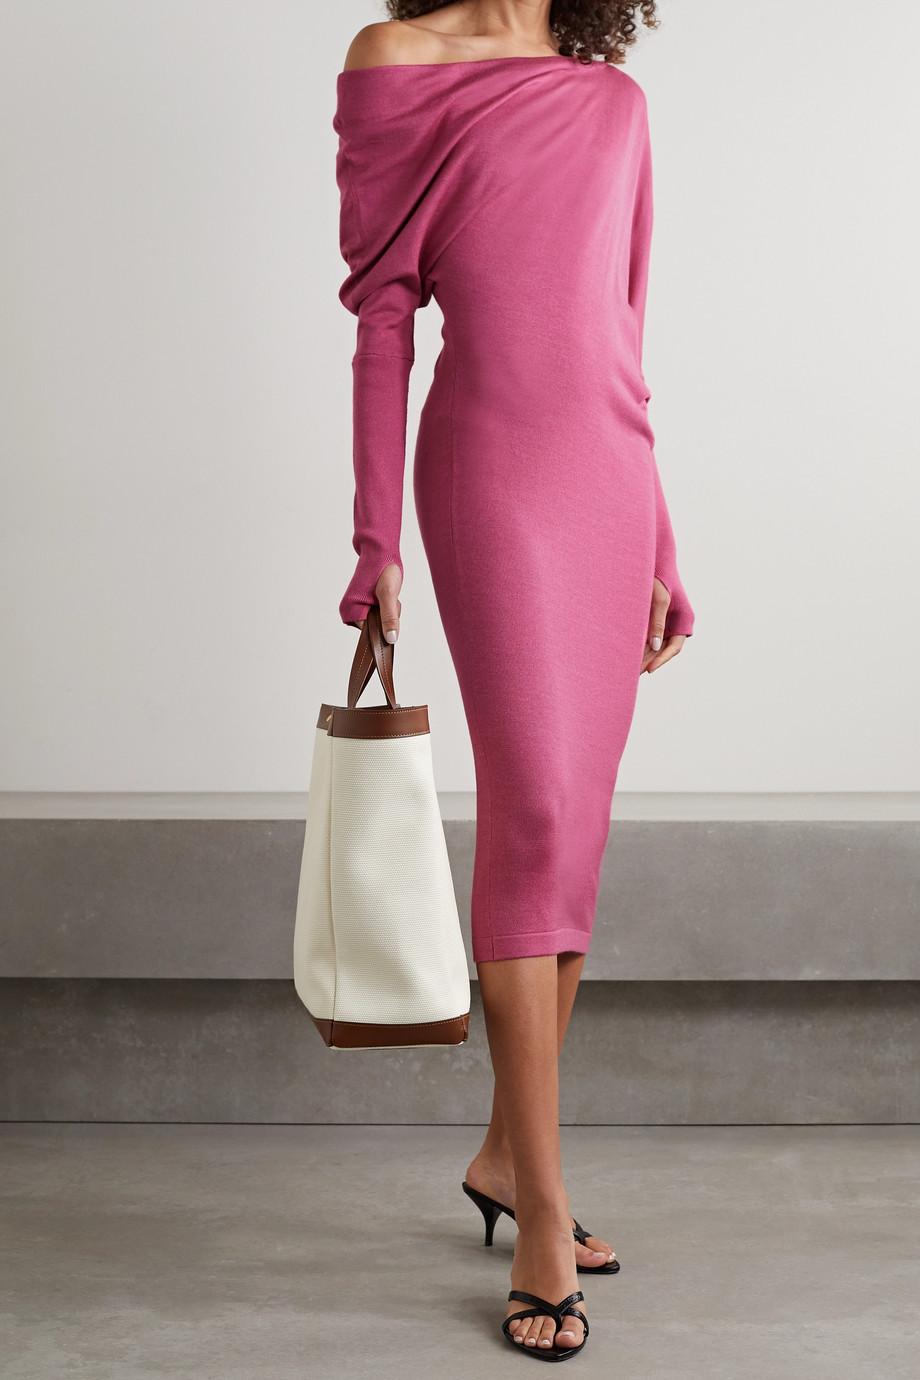 TOM FORD One-shoulder cashmere and silk-blend midi dress